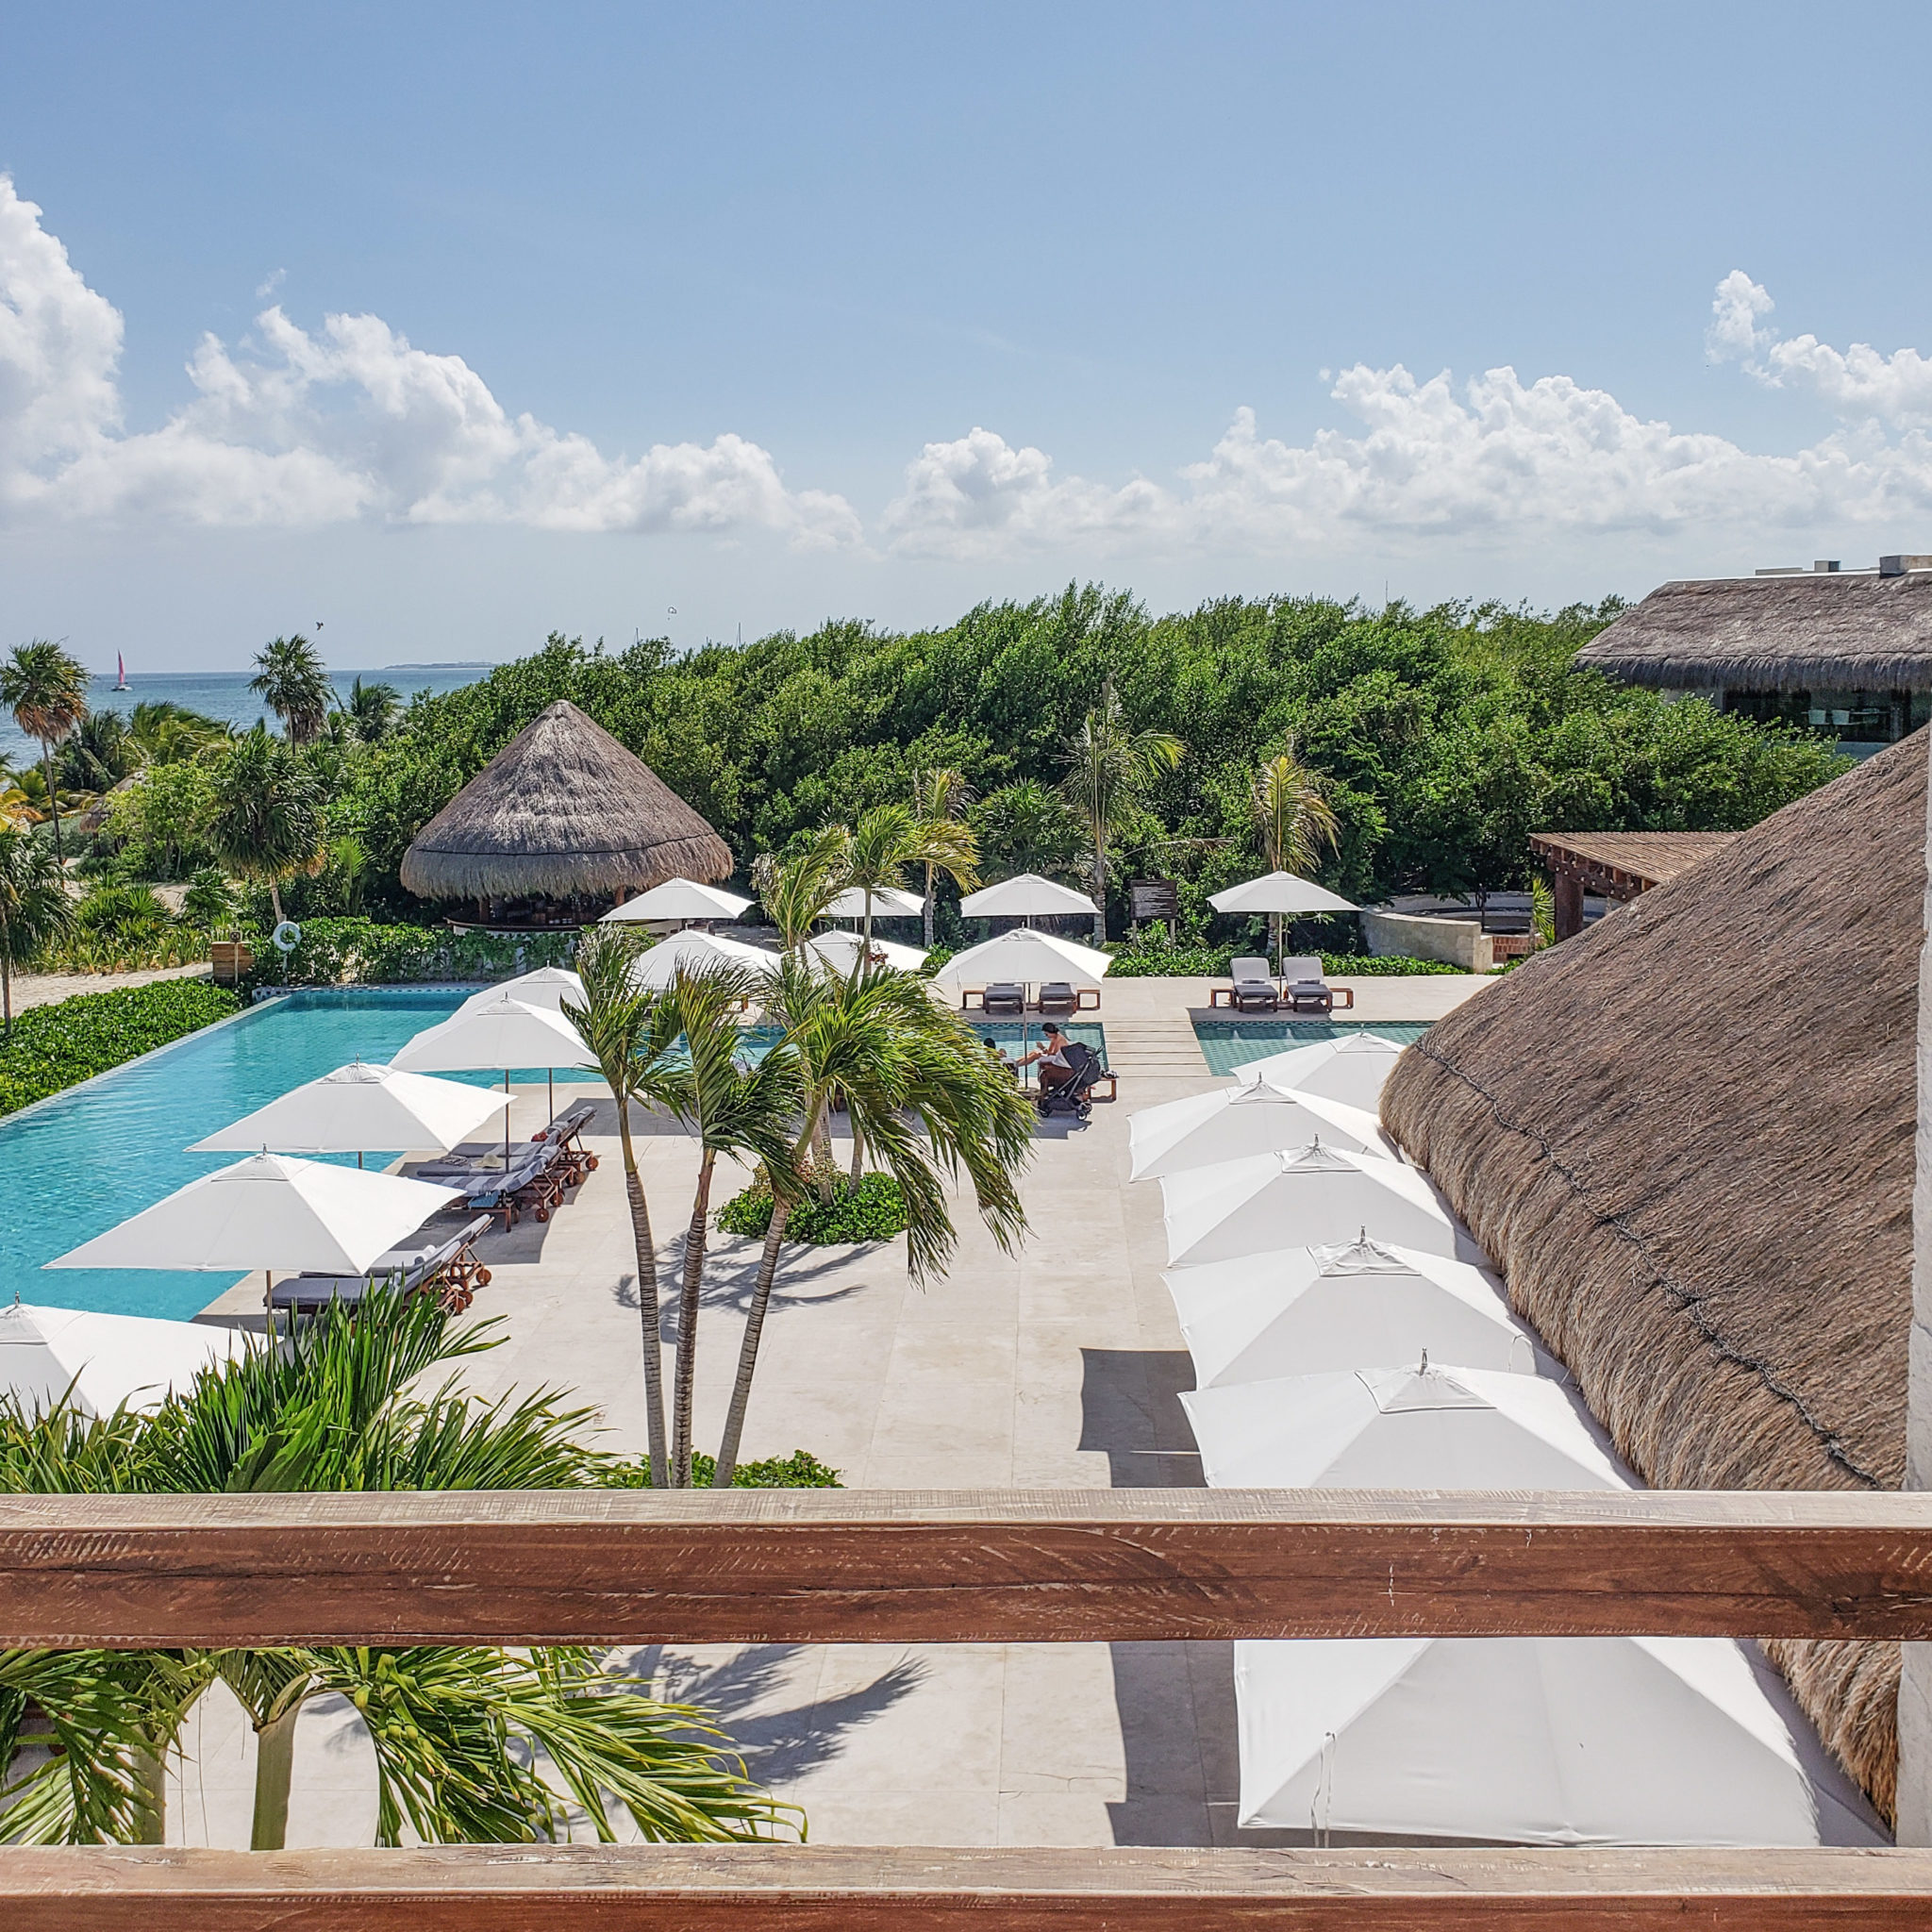 Chable Maroma Resort - Quintana Roo - Playa Del Carmen - Playa Maroma - Poolside View